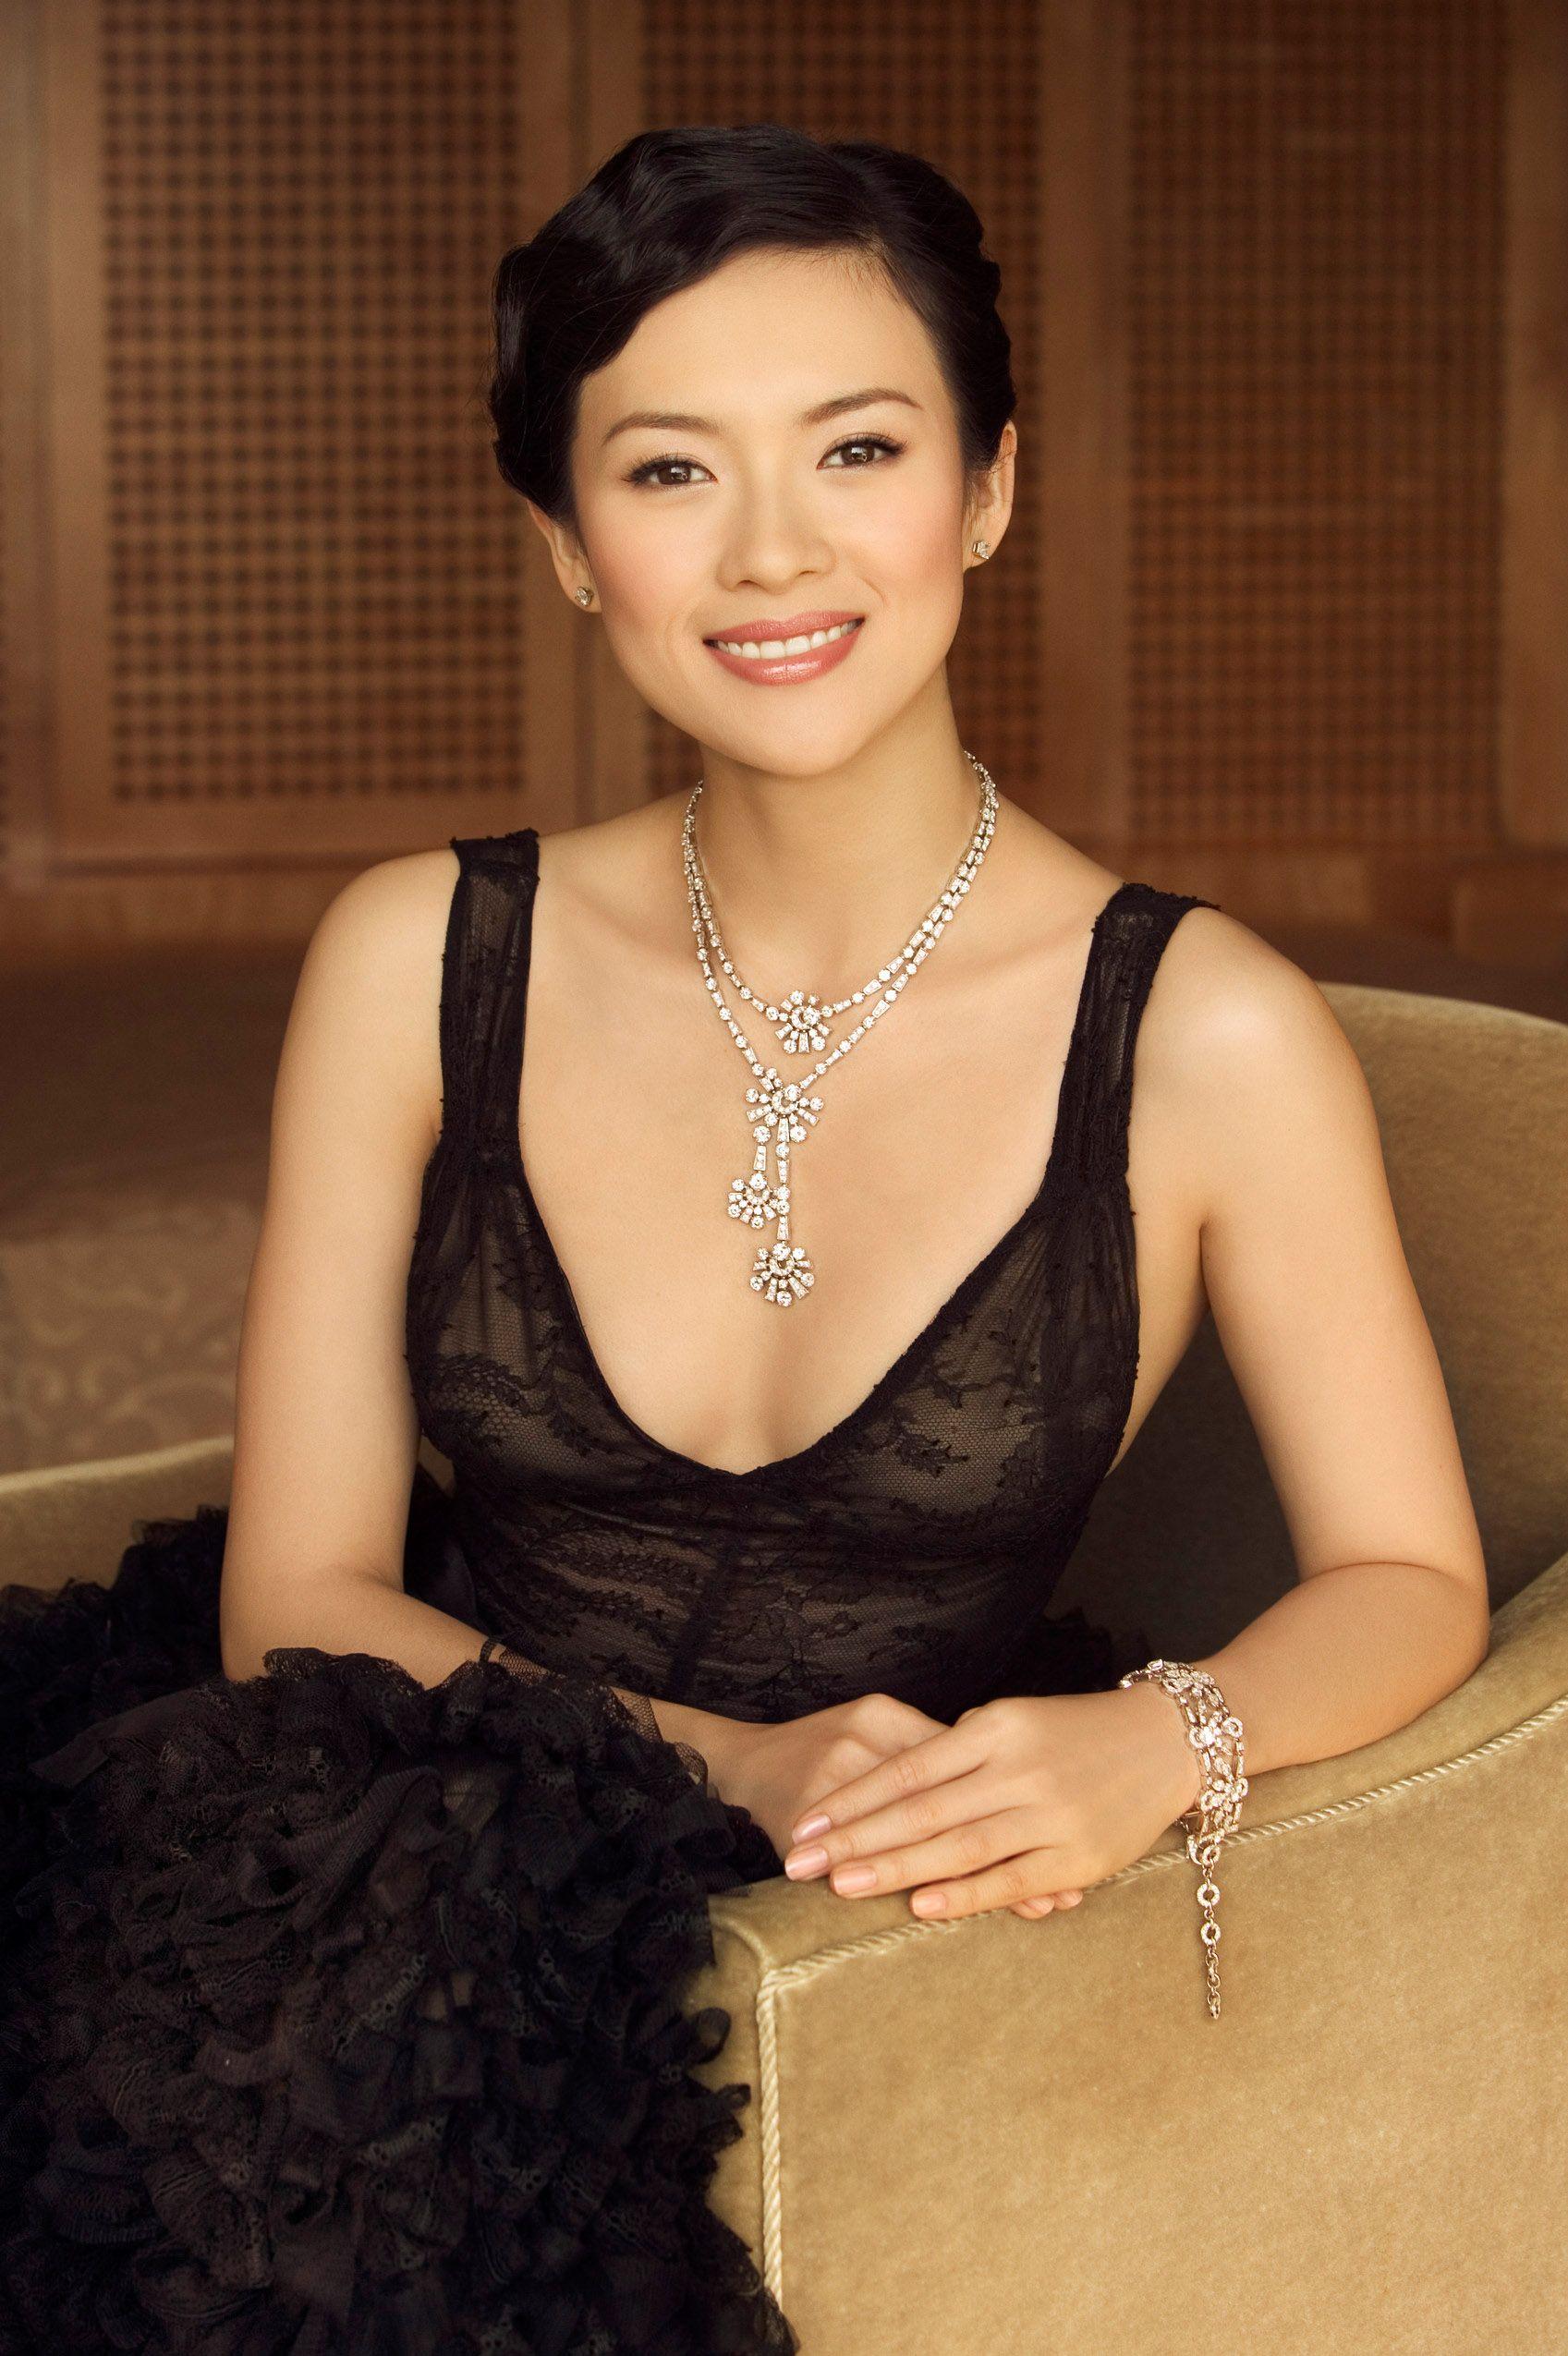 I think Zhang Ziyi is so pretty!